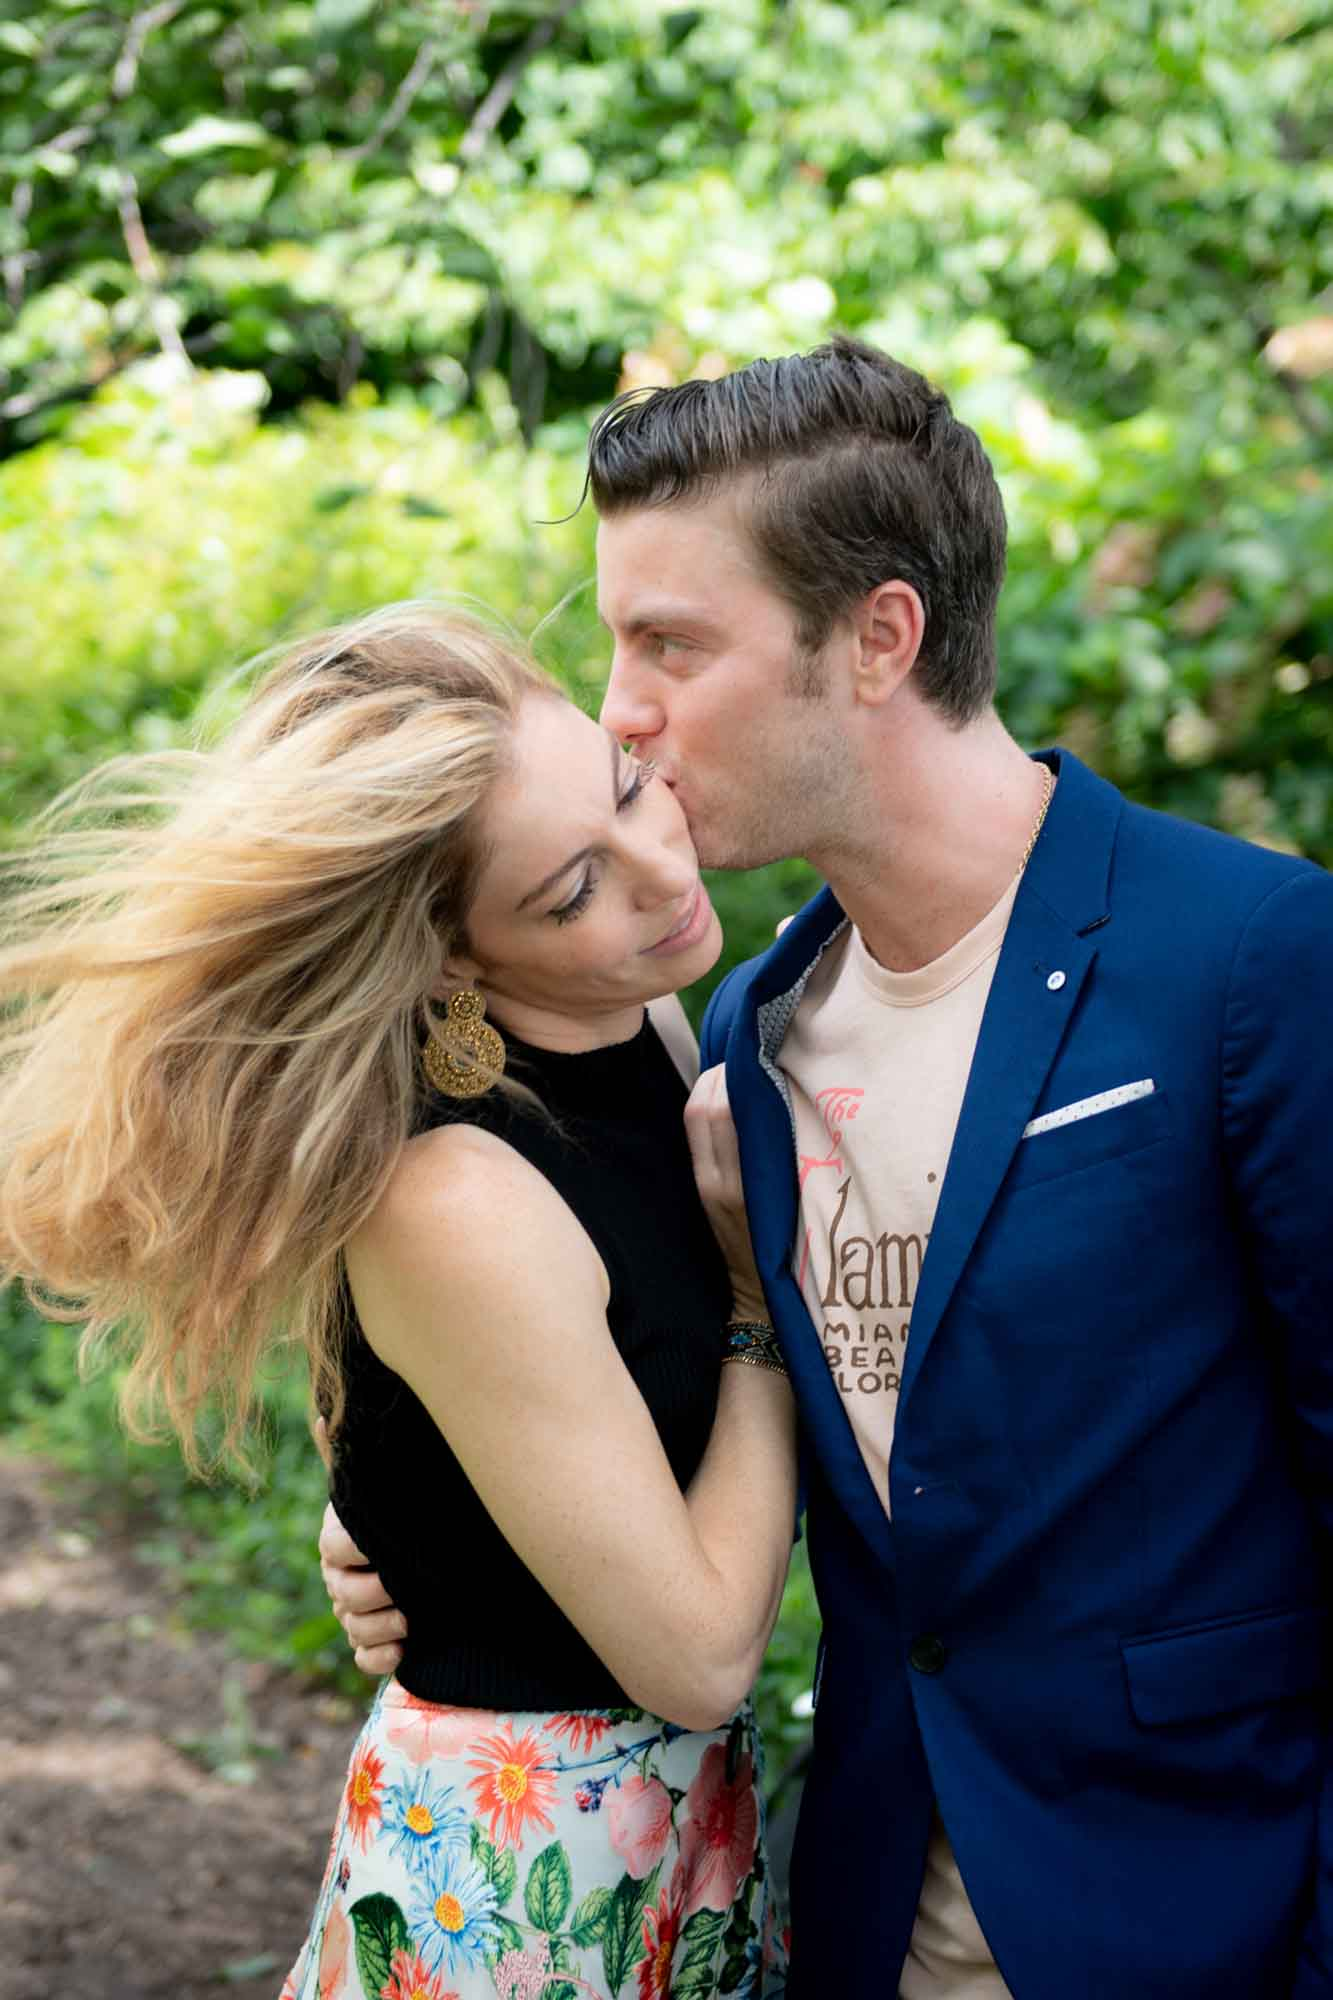 Weddings-Engagements-Jamie-Levine-Photography-NYC-27.jpg